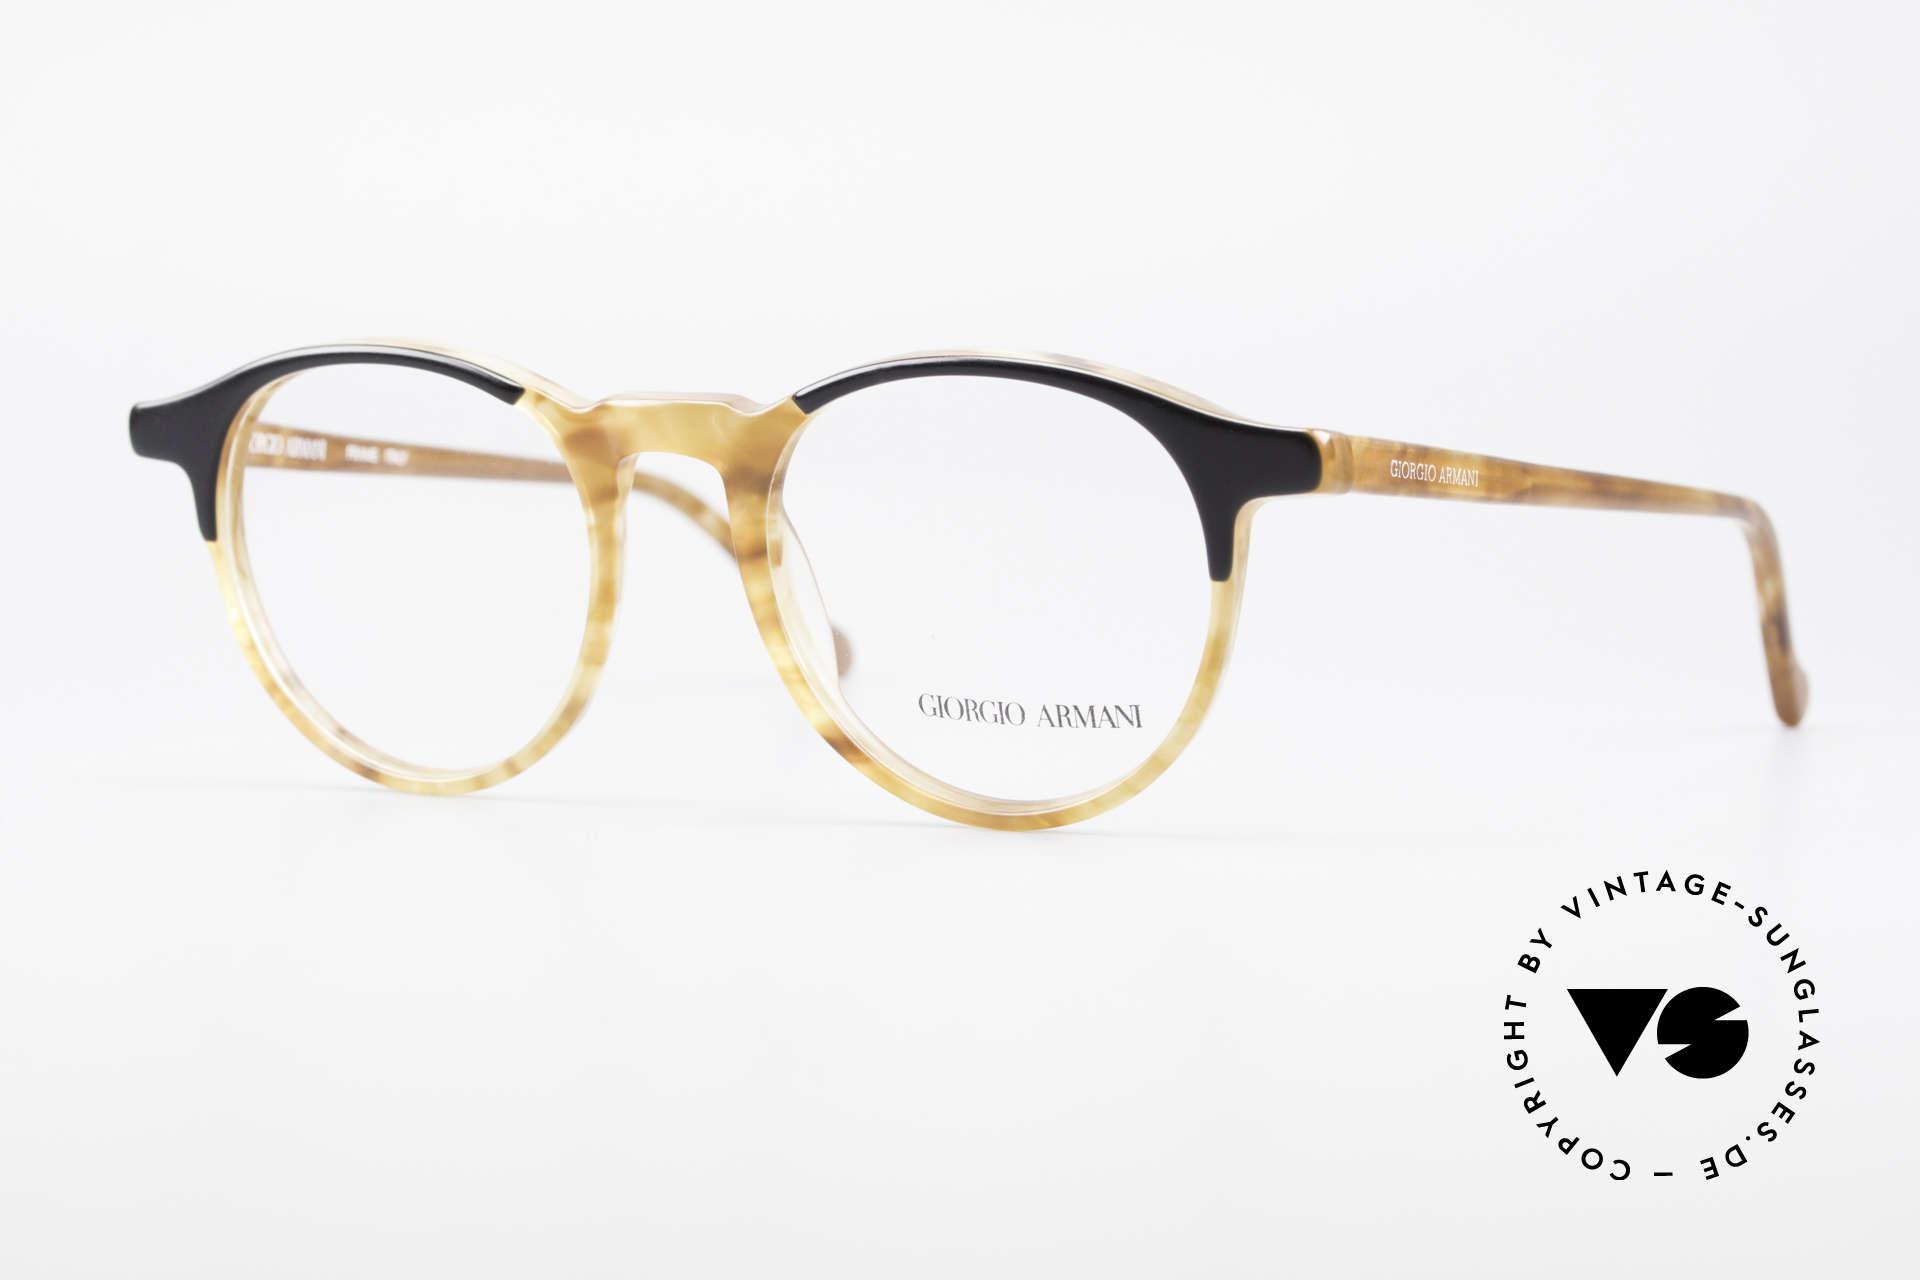 Giorgio Armani 301 Johnny Depp Style Panto Frame, timeless Giorgio Armani designer eyeglasses from Italy, Made for Men